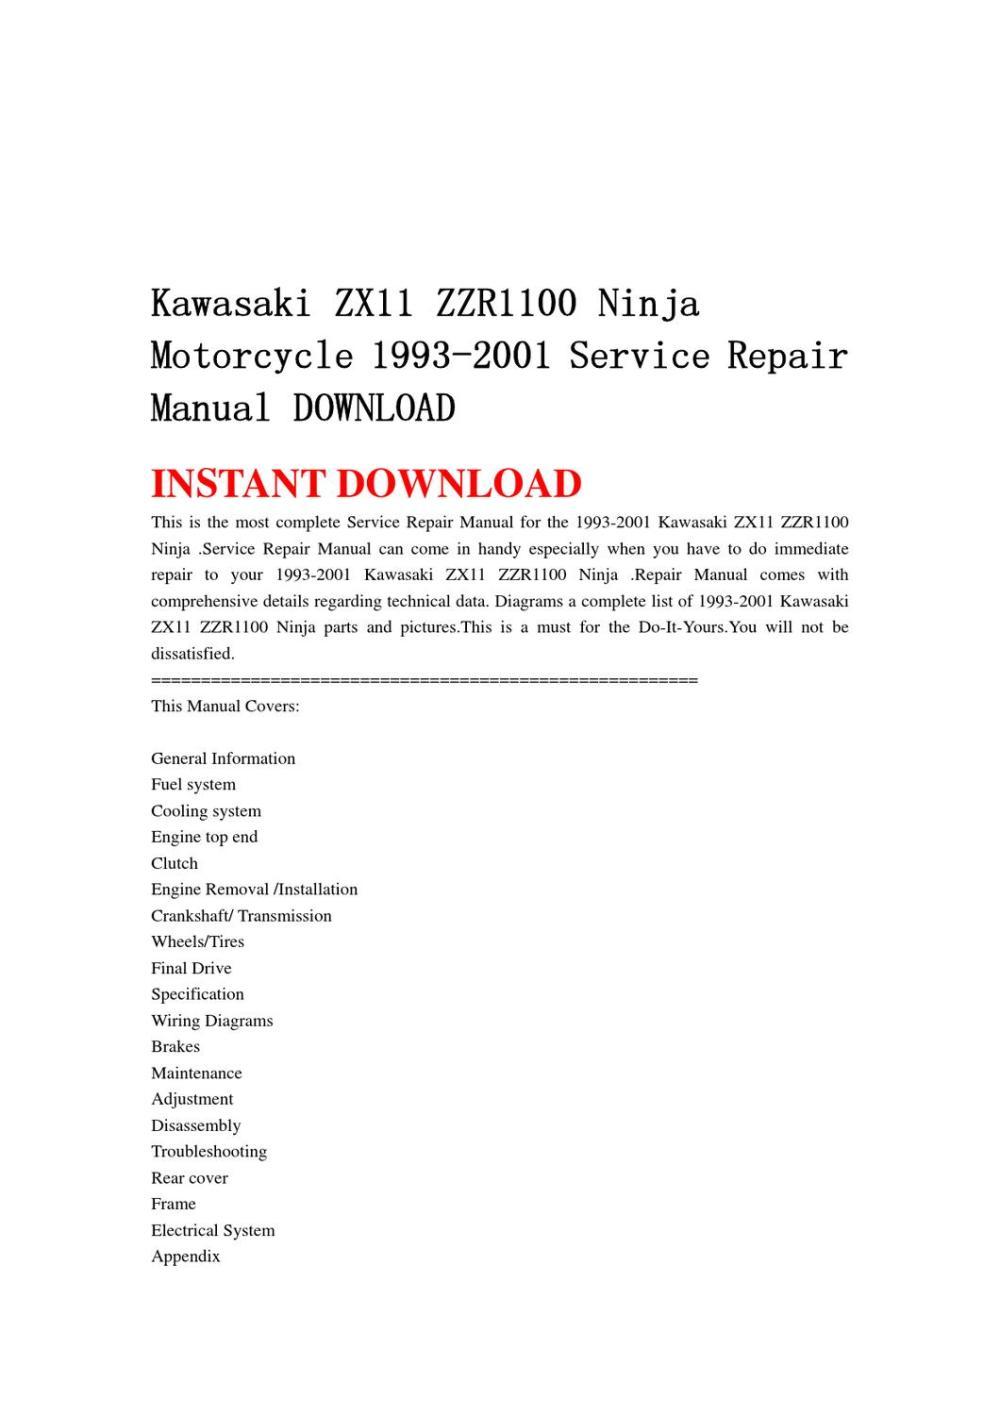 medium resolution of kawasaki zx11 zzr1100 ninja motorcycle 1993 2001 service repair manual download by qin wanga issuu